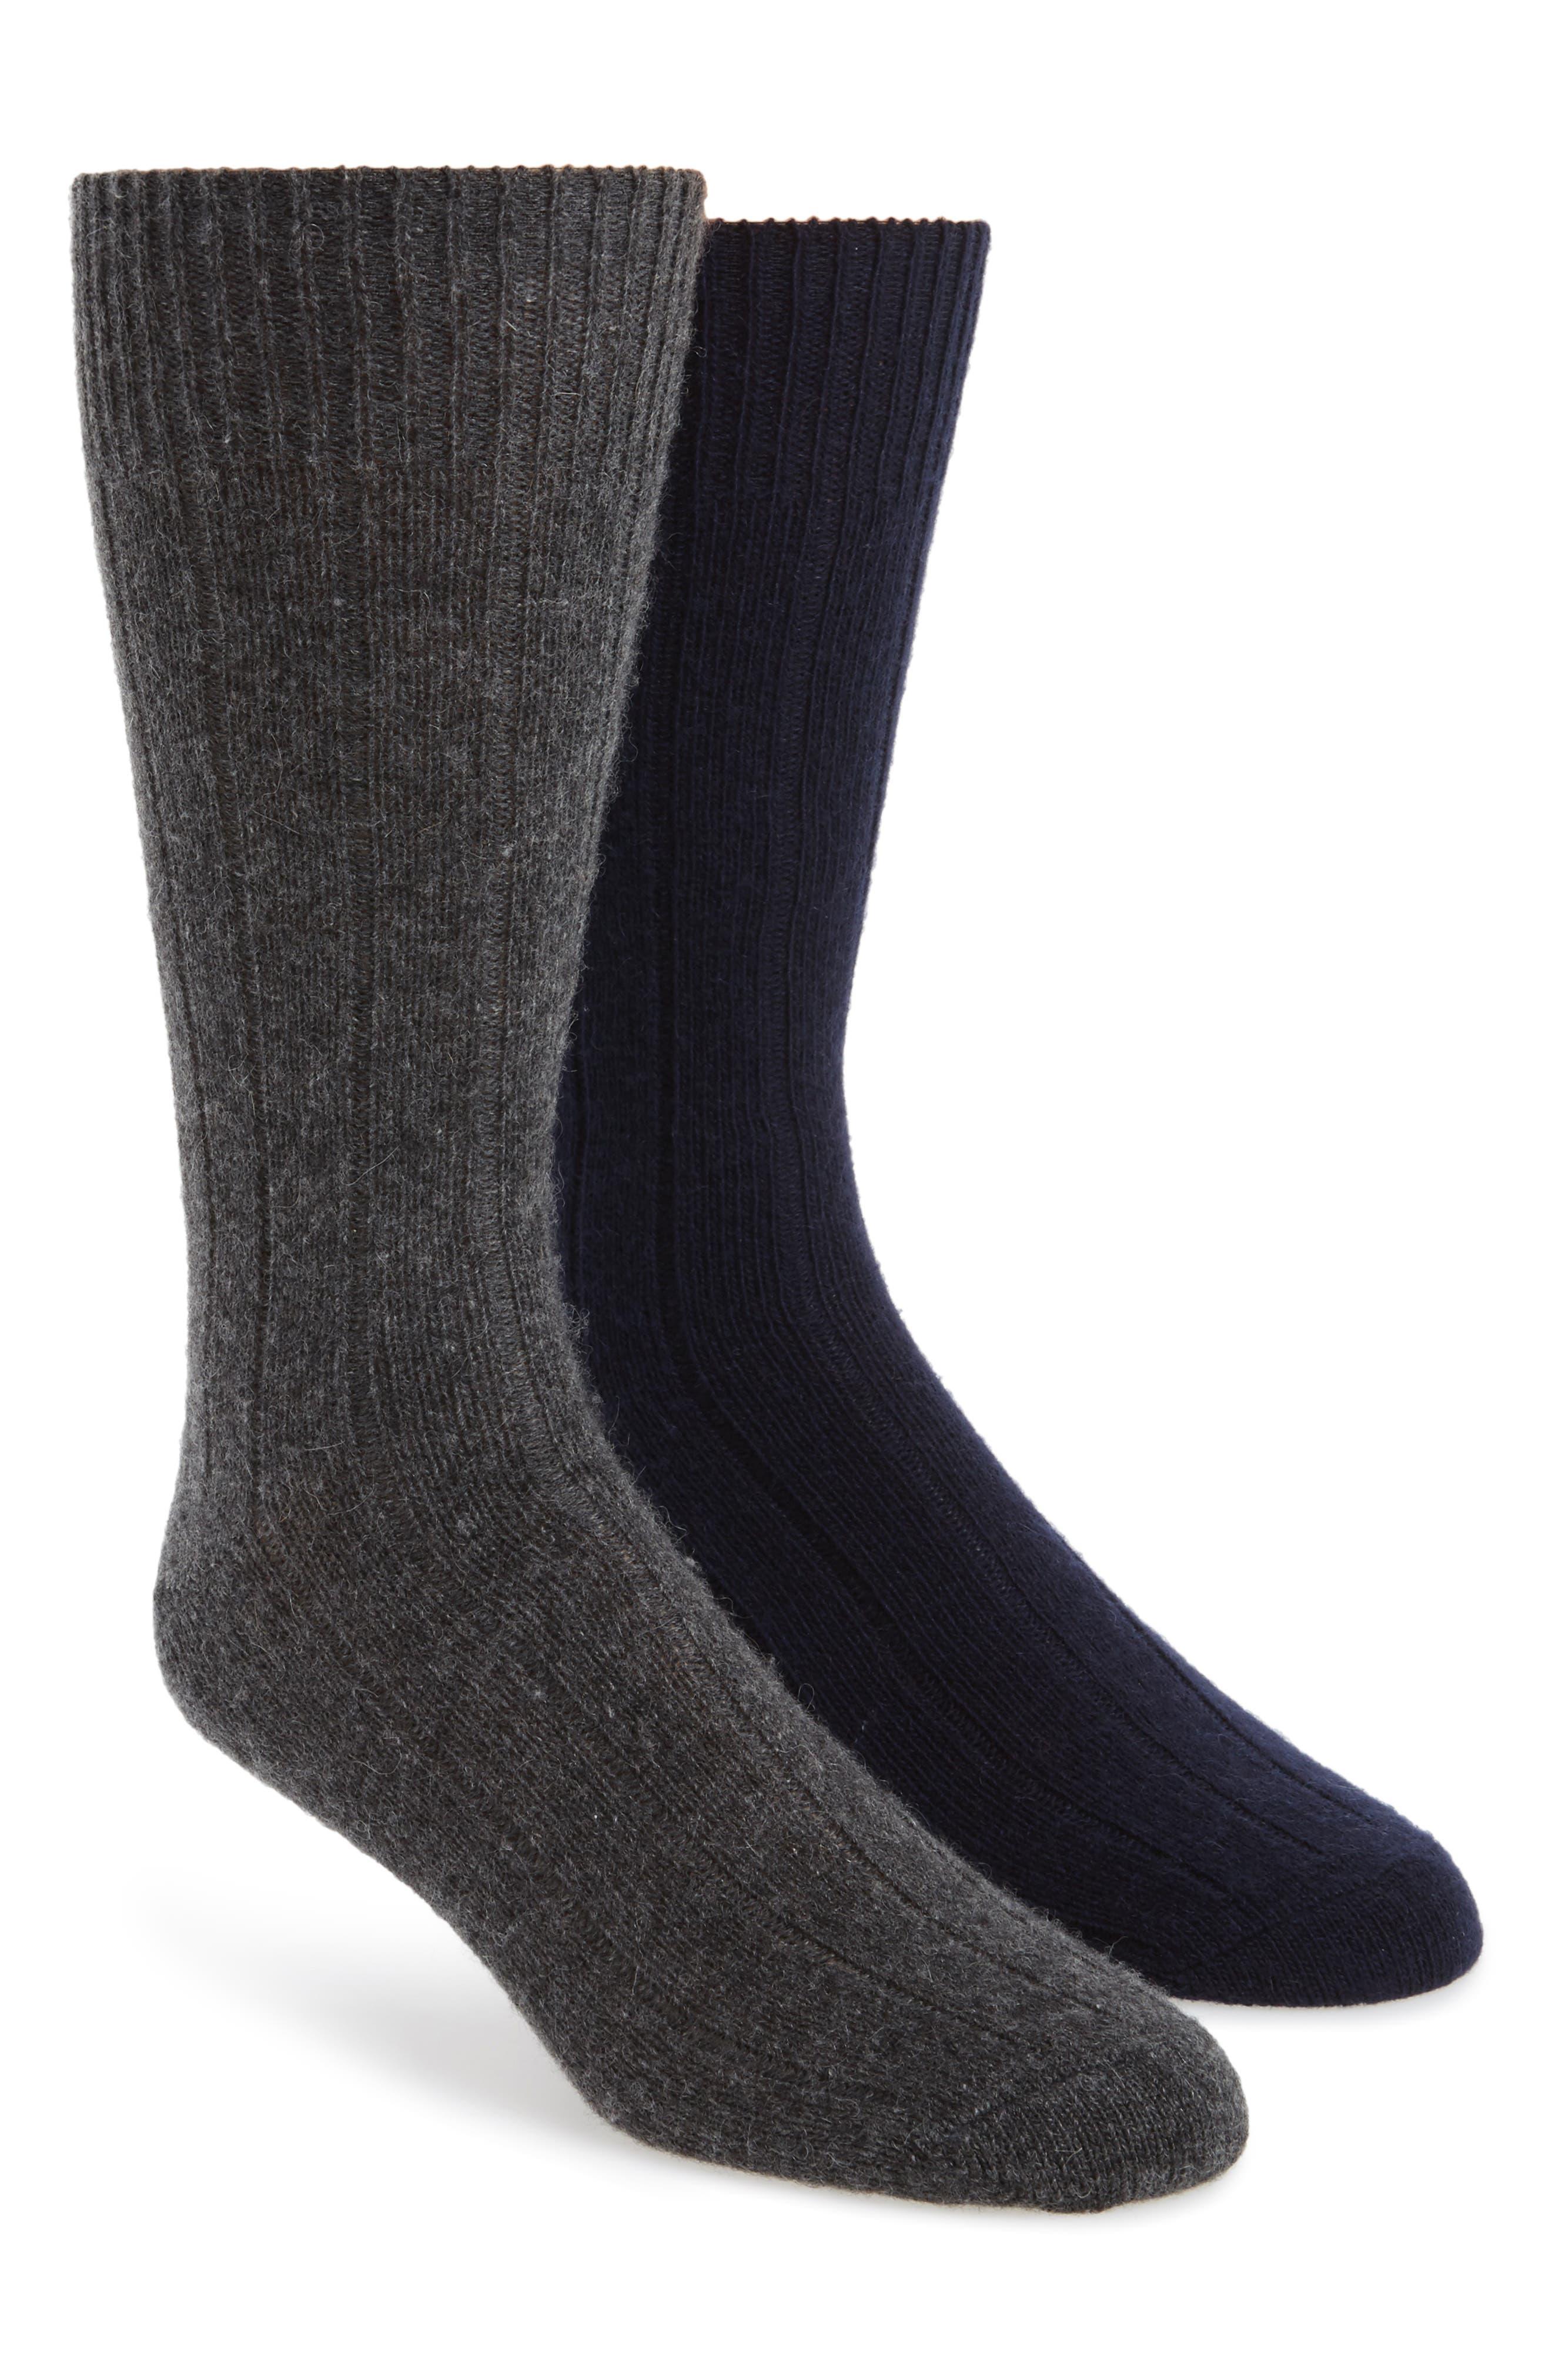 2-Pack Cashmere Blend Socks Box Set,                             Main thumbnail 1, color,                             Navy/ Charcoal